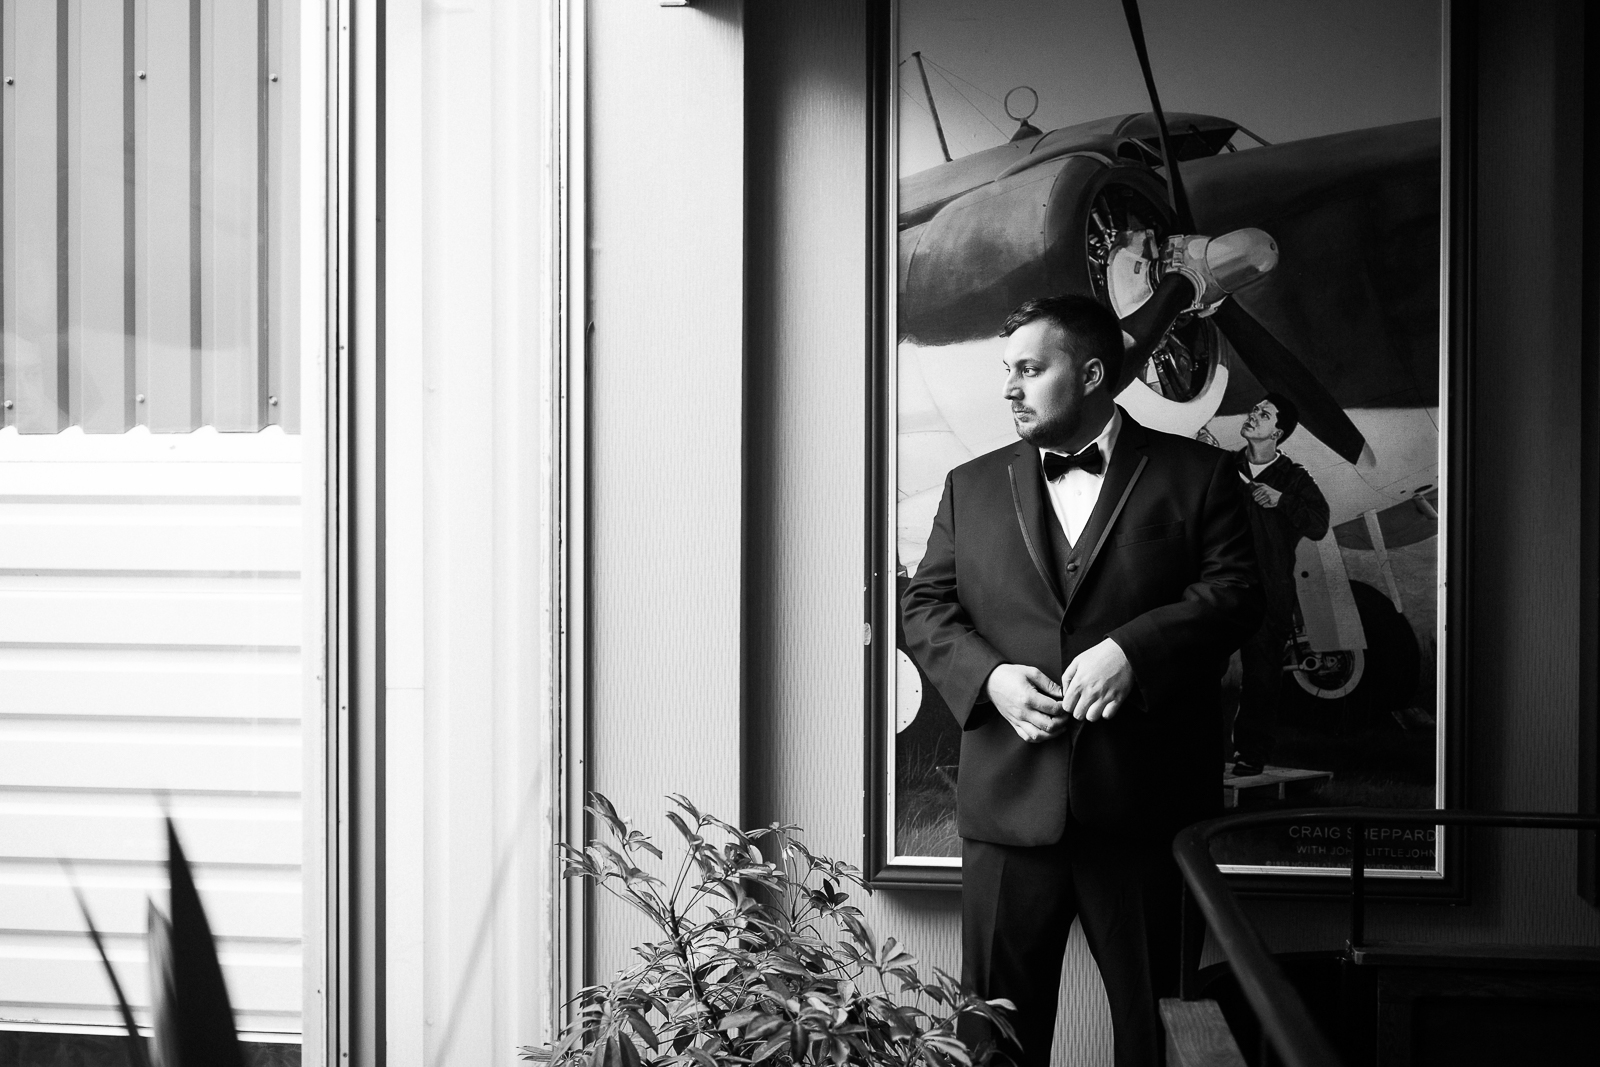 gander-wedding-photographer-8.jpg